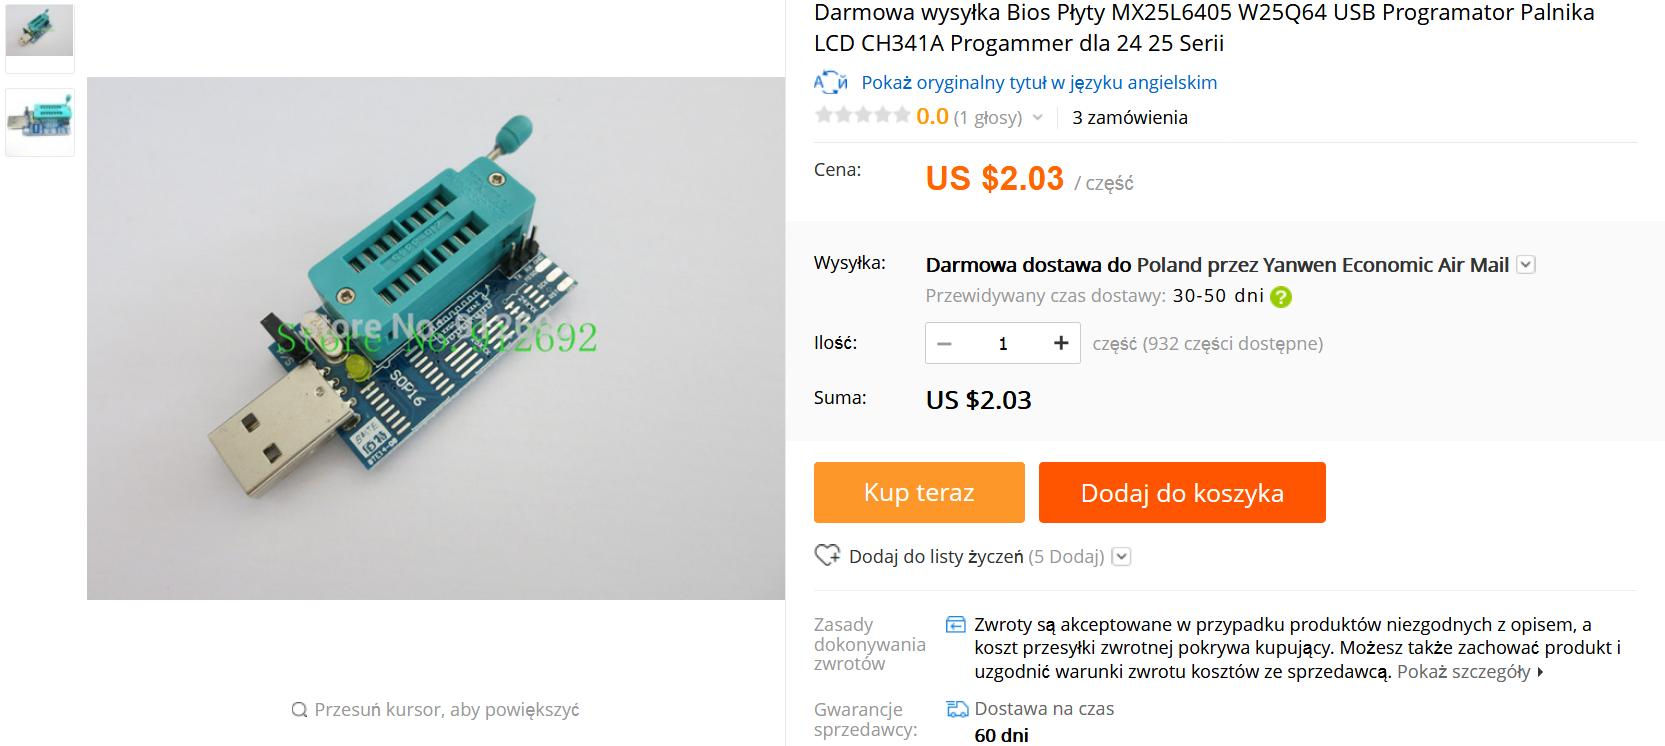 Programator pamięci BIOS MX25L6405 W25Q64 USB Programator CH341A